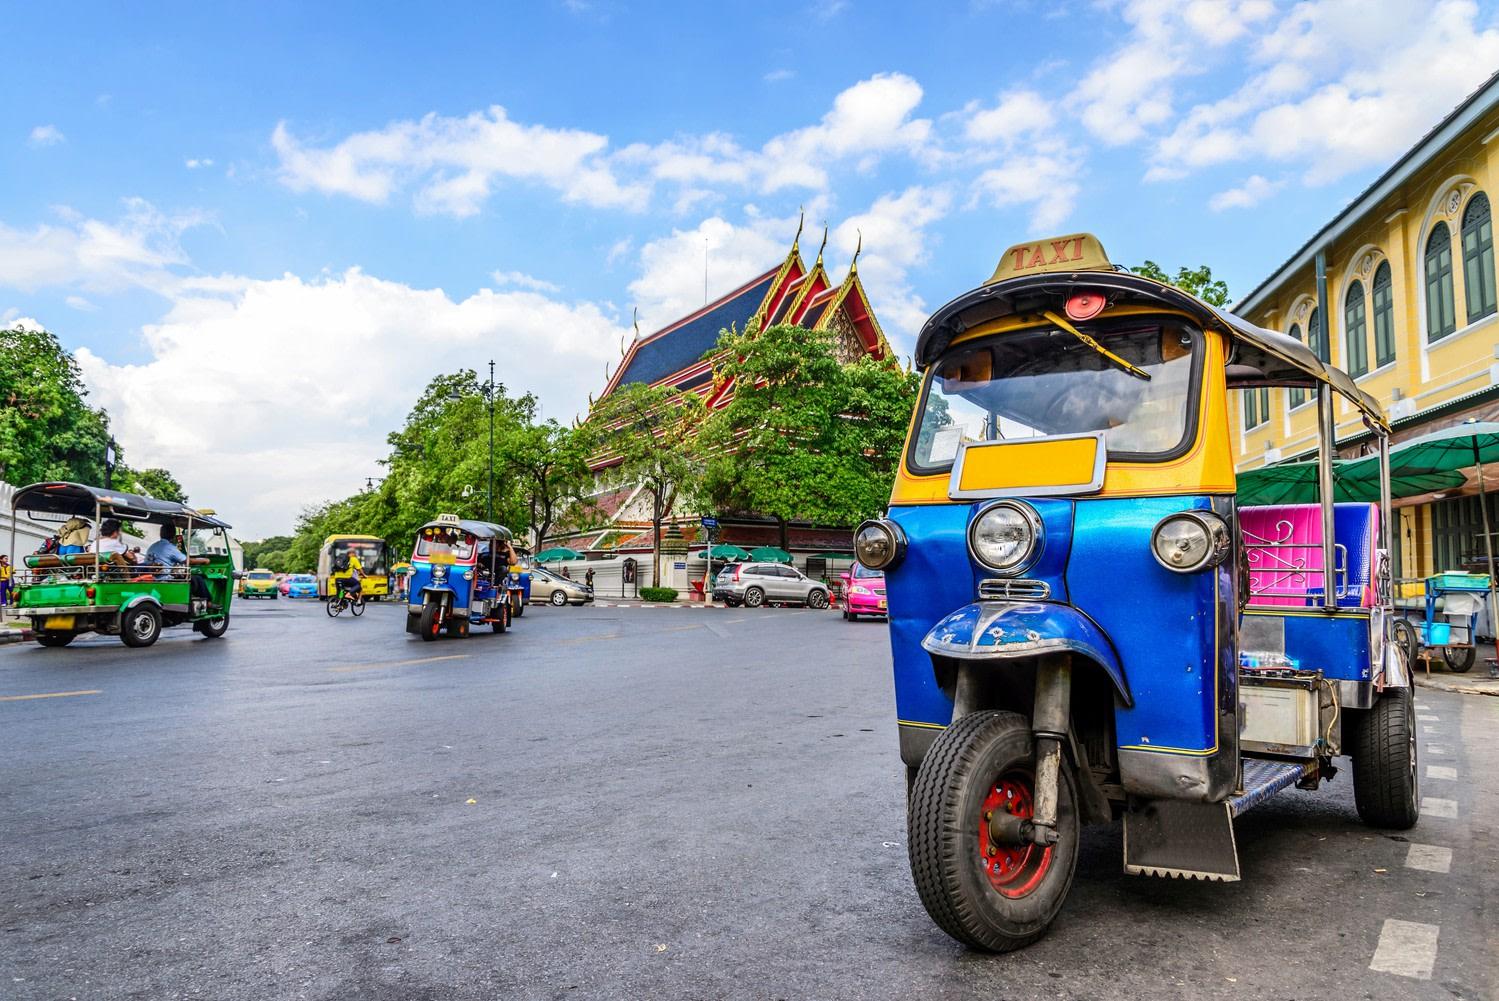 Transports - Tuk Tuk transport typique thaïlandais dans une rue de Phuket